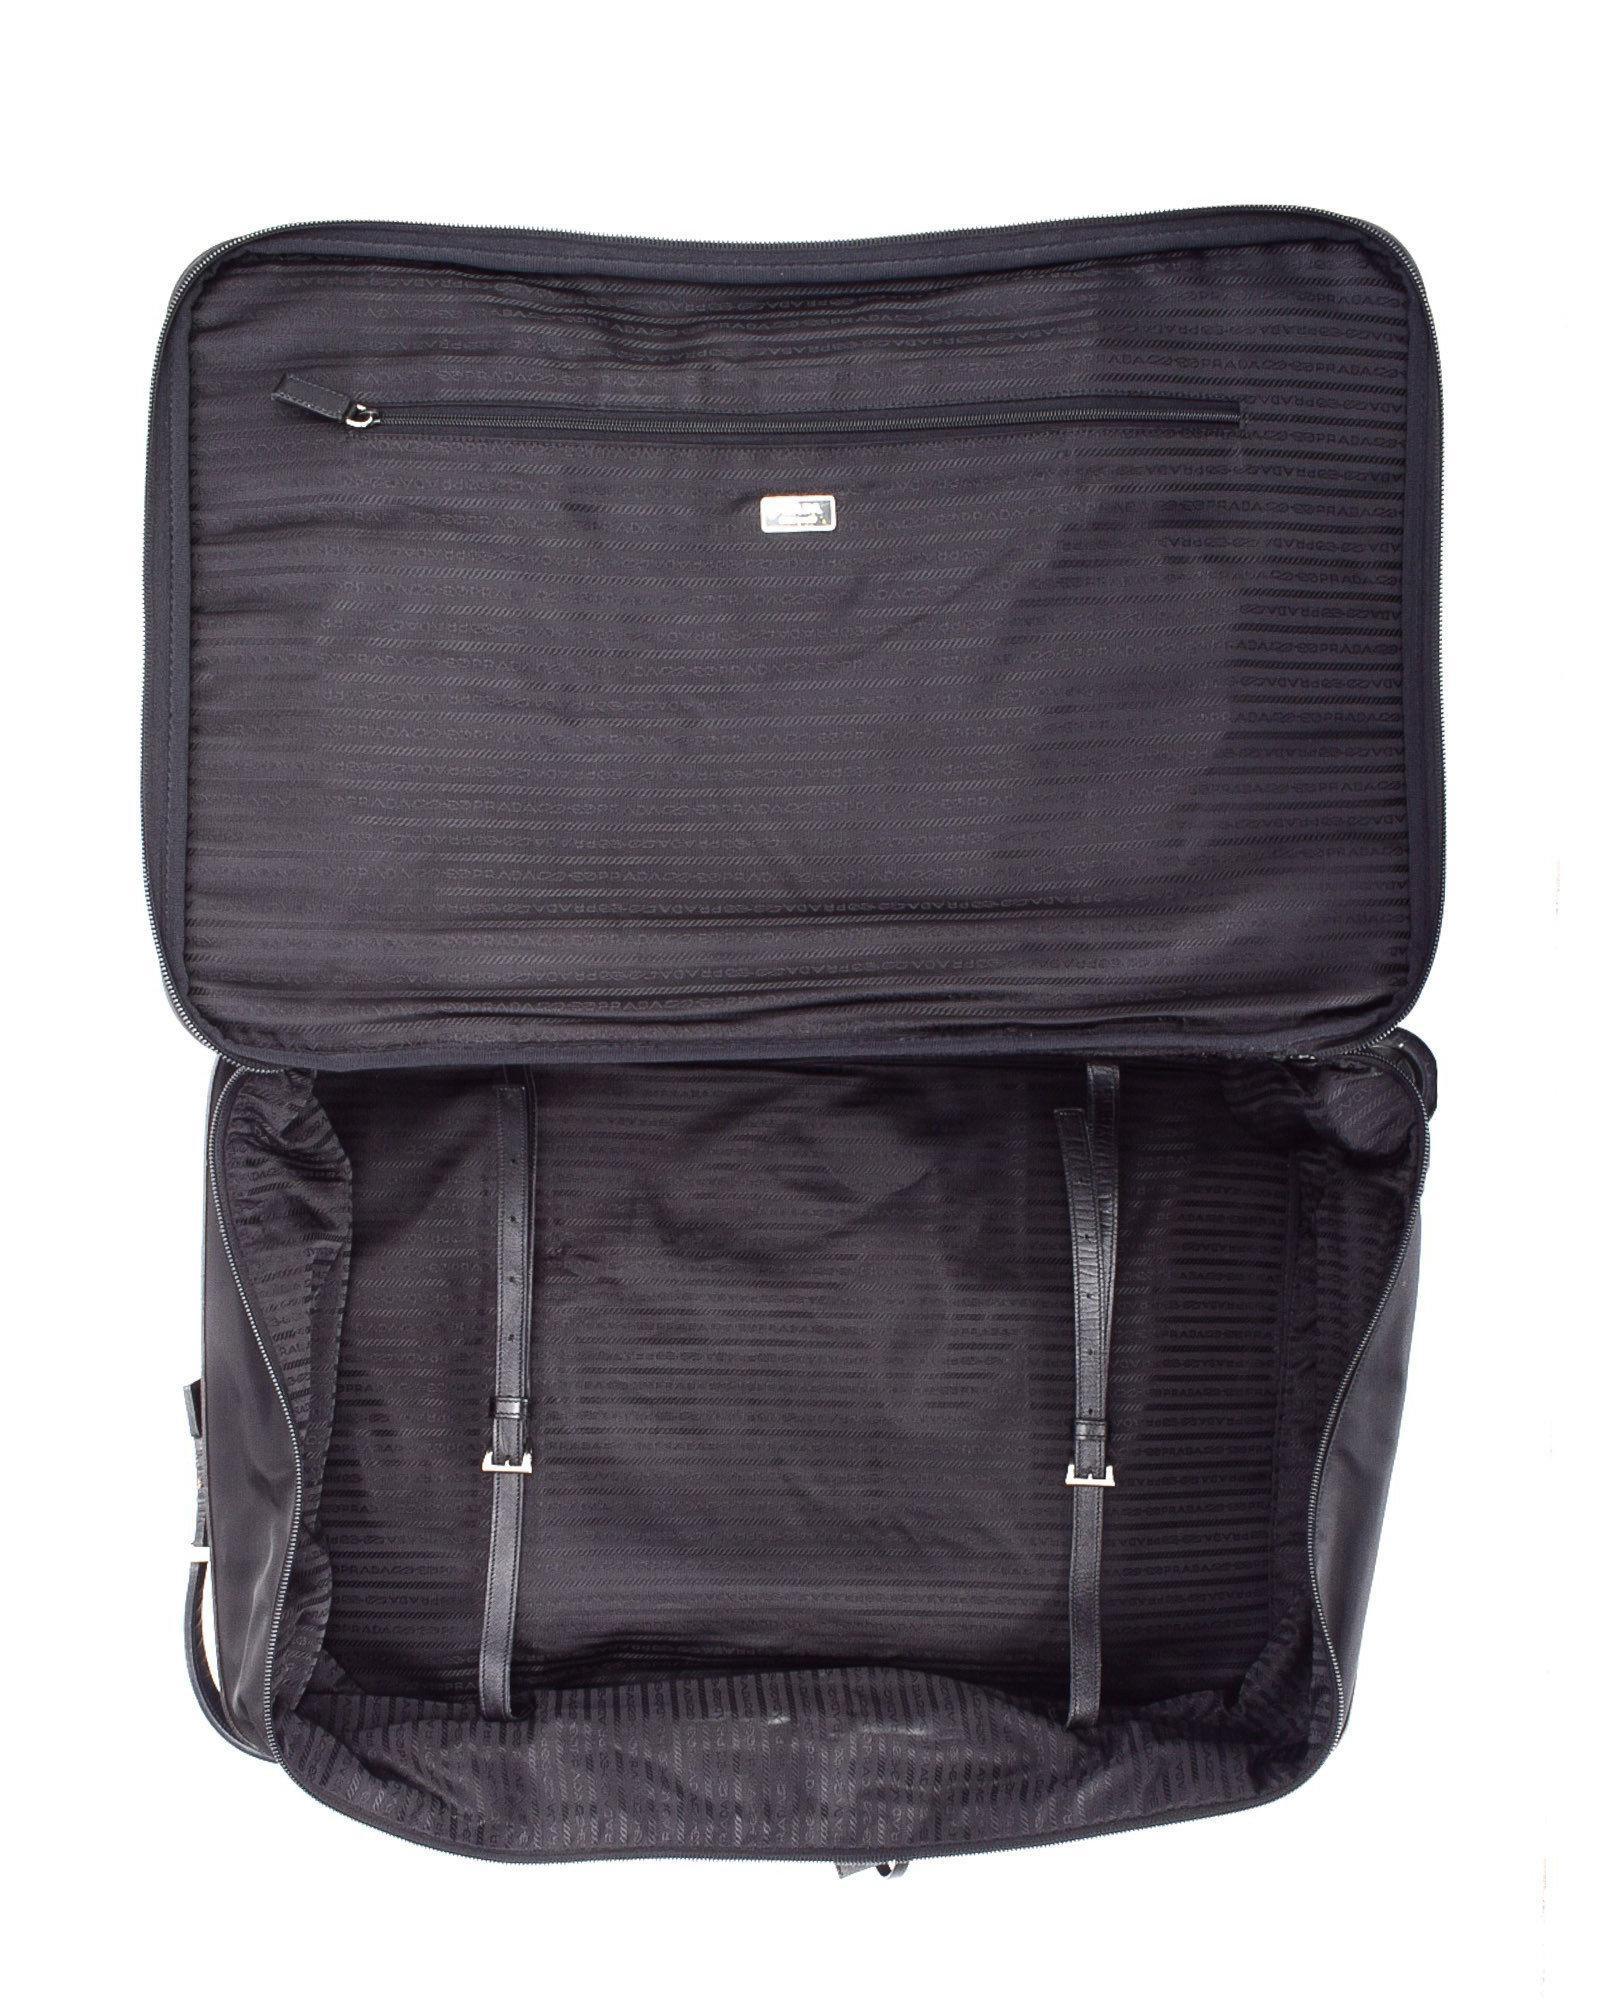 a4e02539270b ... release date lyst prada tessuto travel bag vintage in black d778f 80fb9